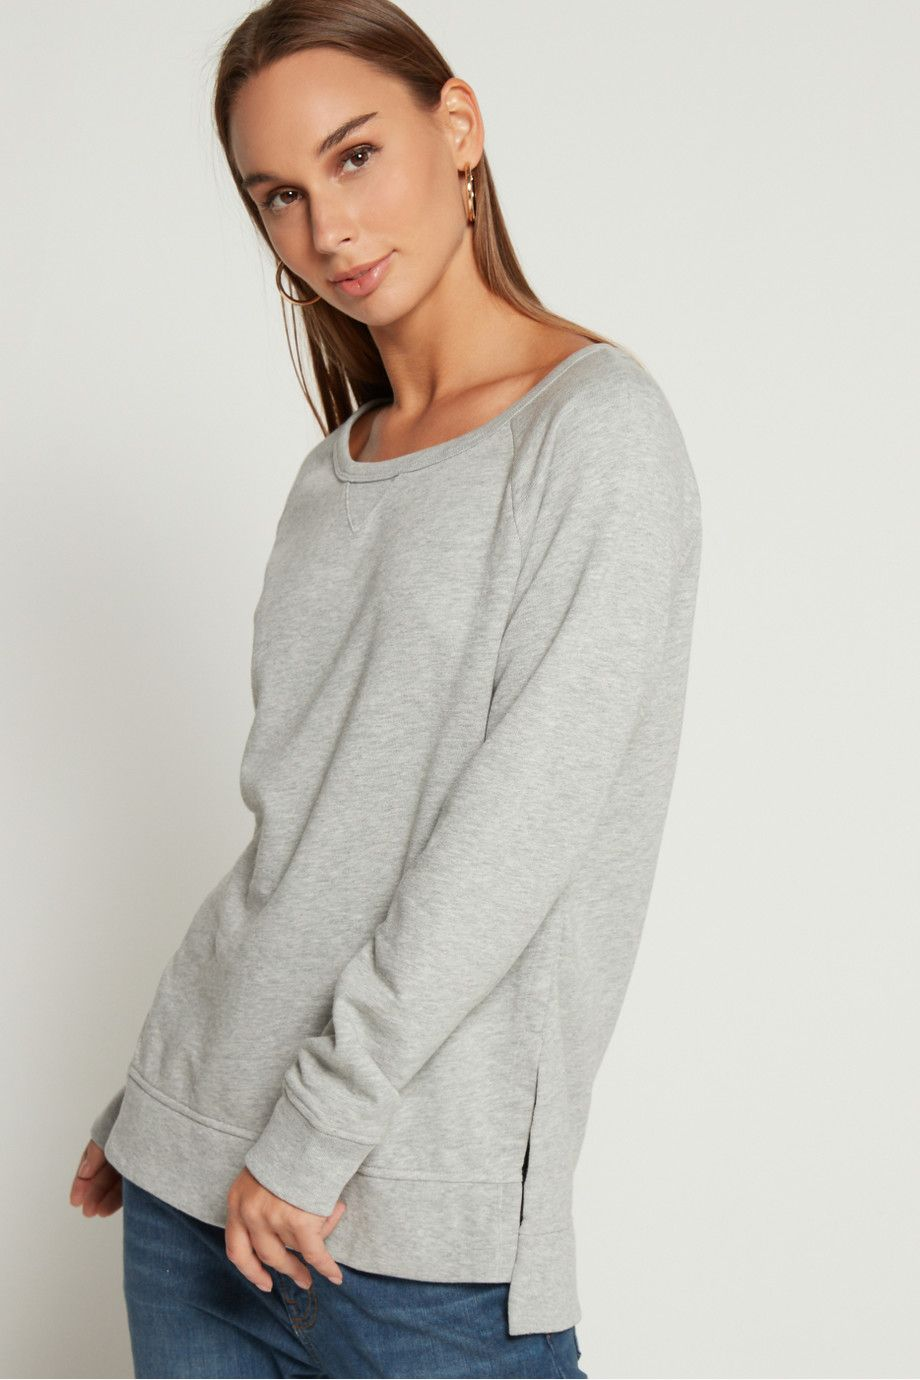 Shop Gap Raglan Sleeve Pullover Sweatshirt Tunic For Women Online Experience Next Level Online Shopping With Nis Tunic Sweatshirt Pullover Pullover Sweatshirt [ 1380 x 920 Pixel ]